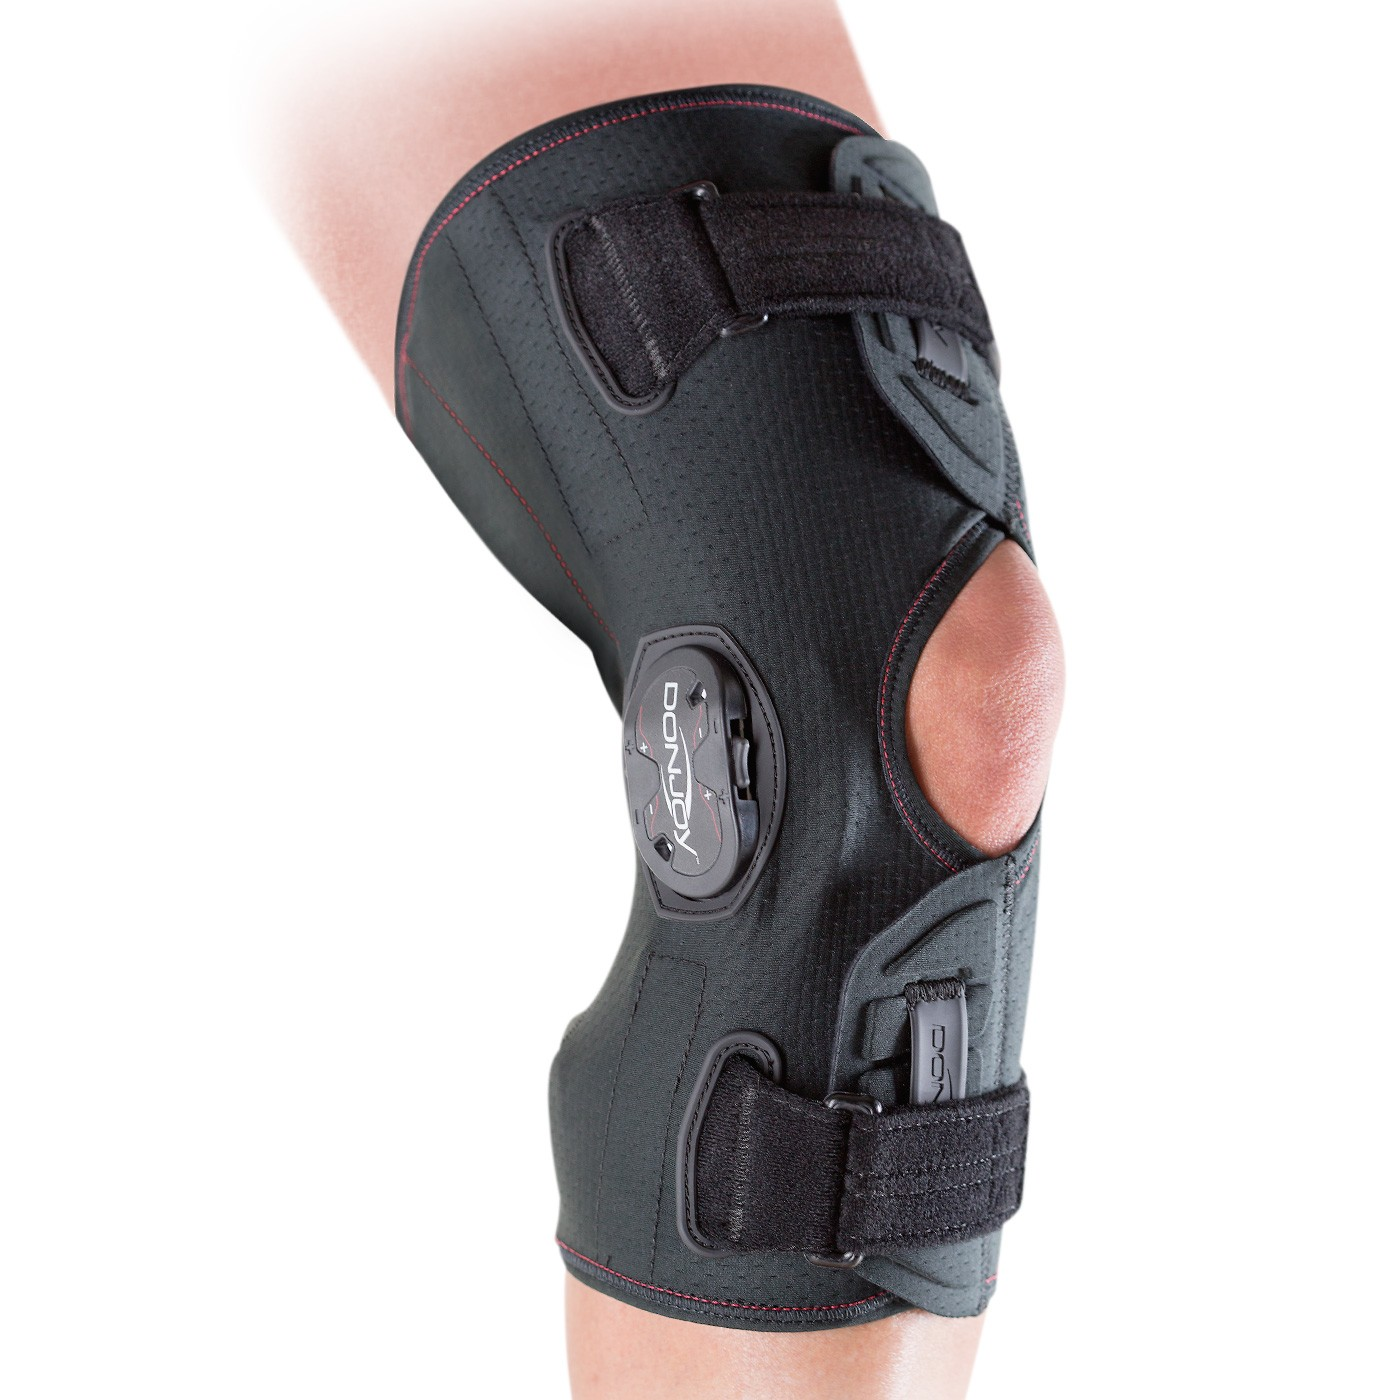 DonJoy Clima-Flex OA Knee Brace - On Skin